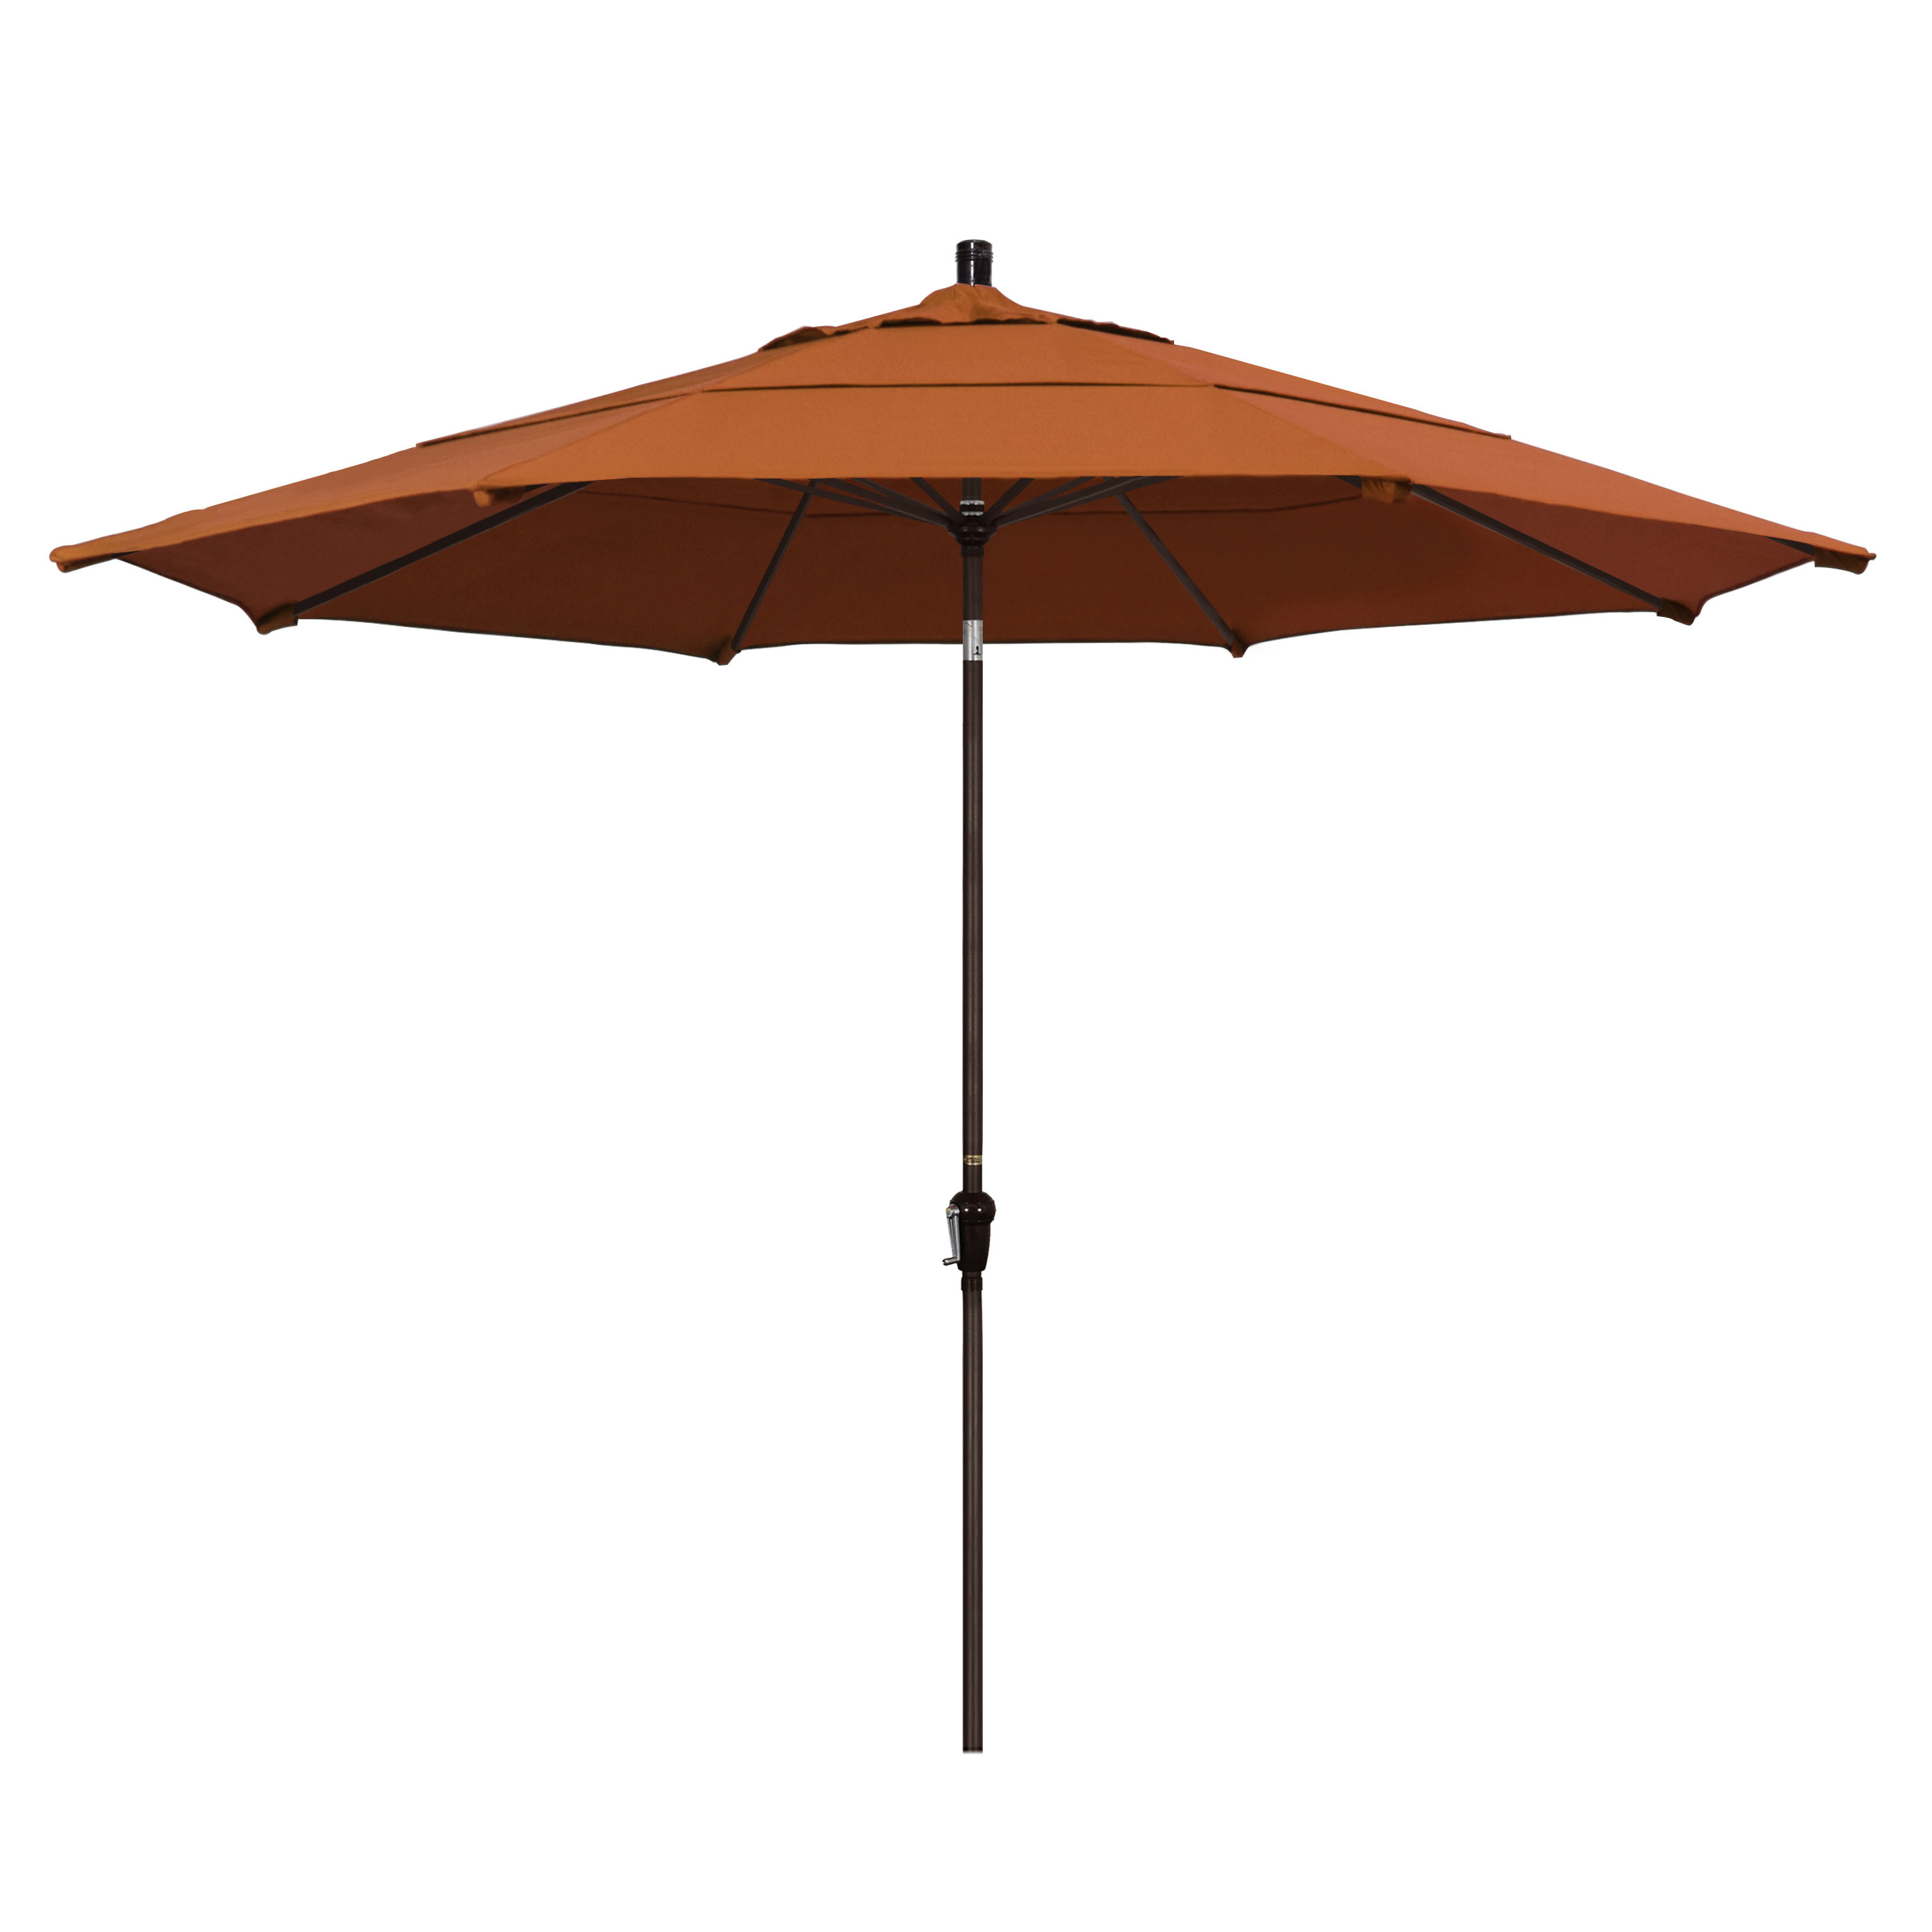 Mullaney Market Umbrellas Throughout Fashionable Mullaney 11' Market Sunbrella Umbrella (View 3 of 20)